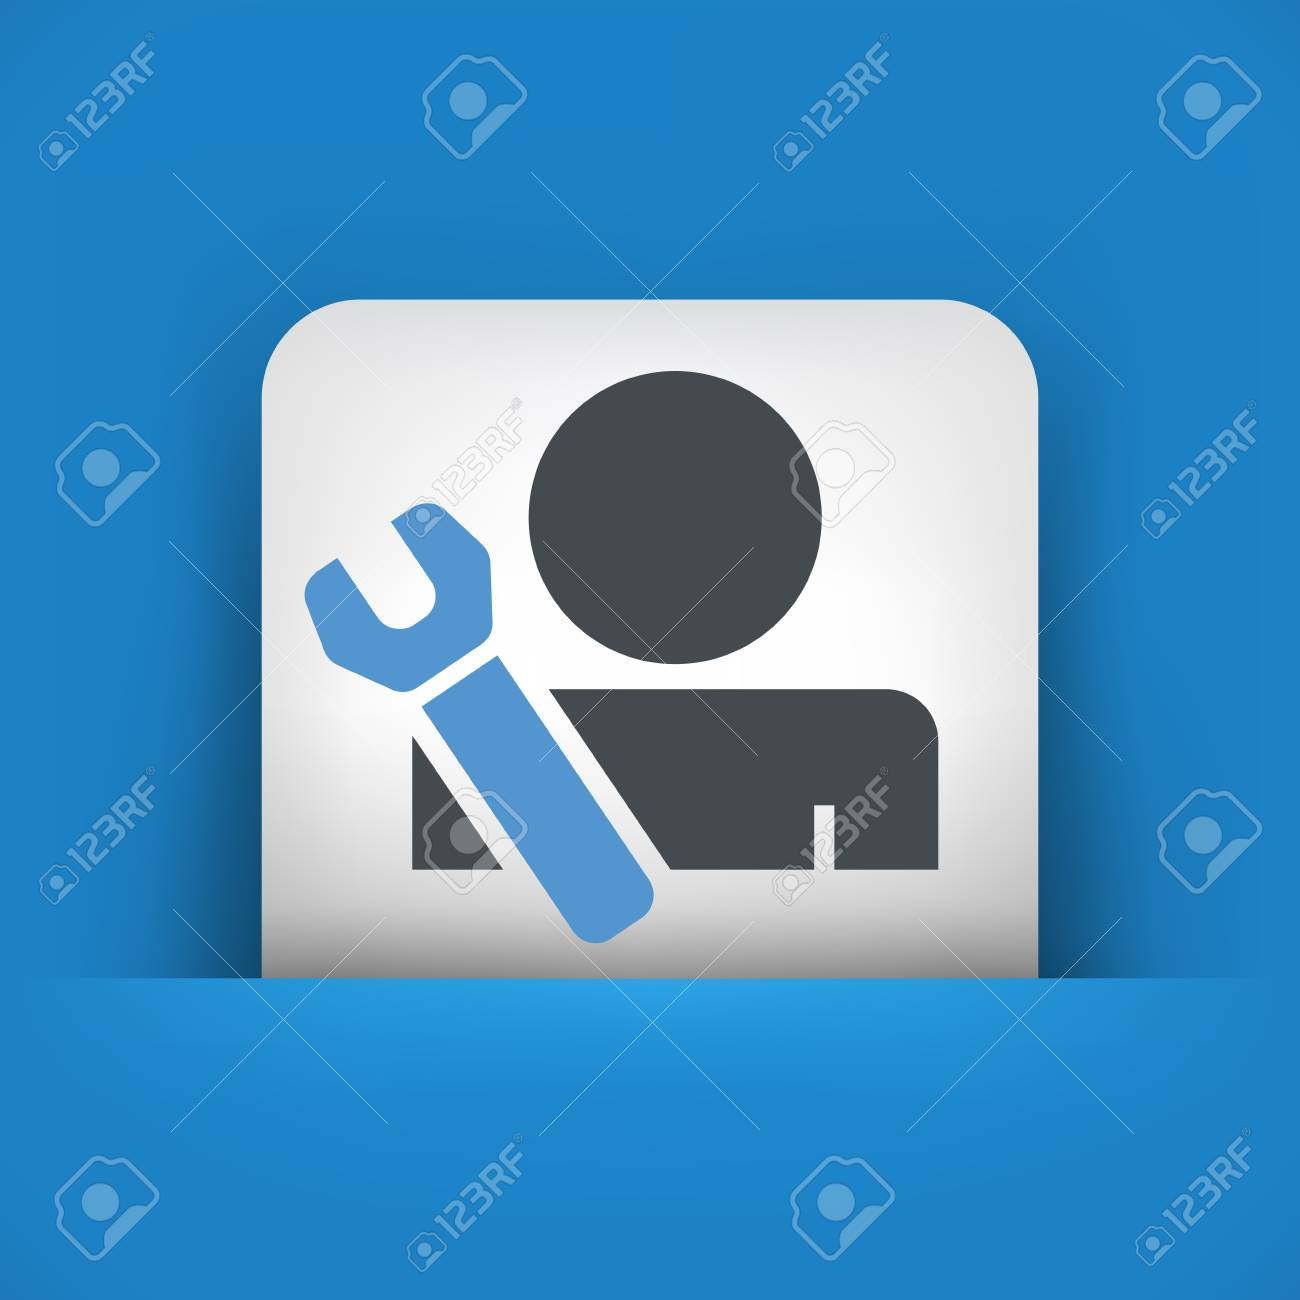 Worker concept symbol icon Stock Vector - 19875789